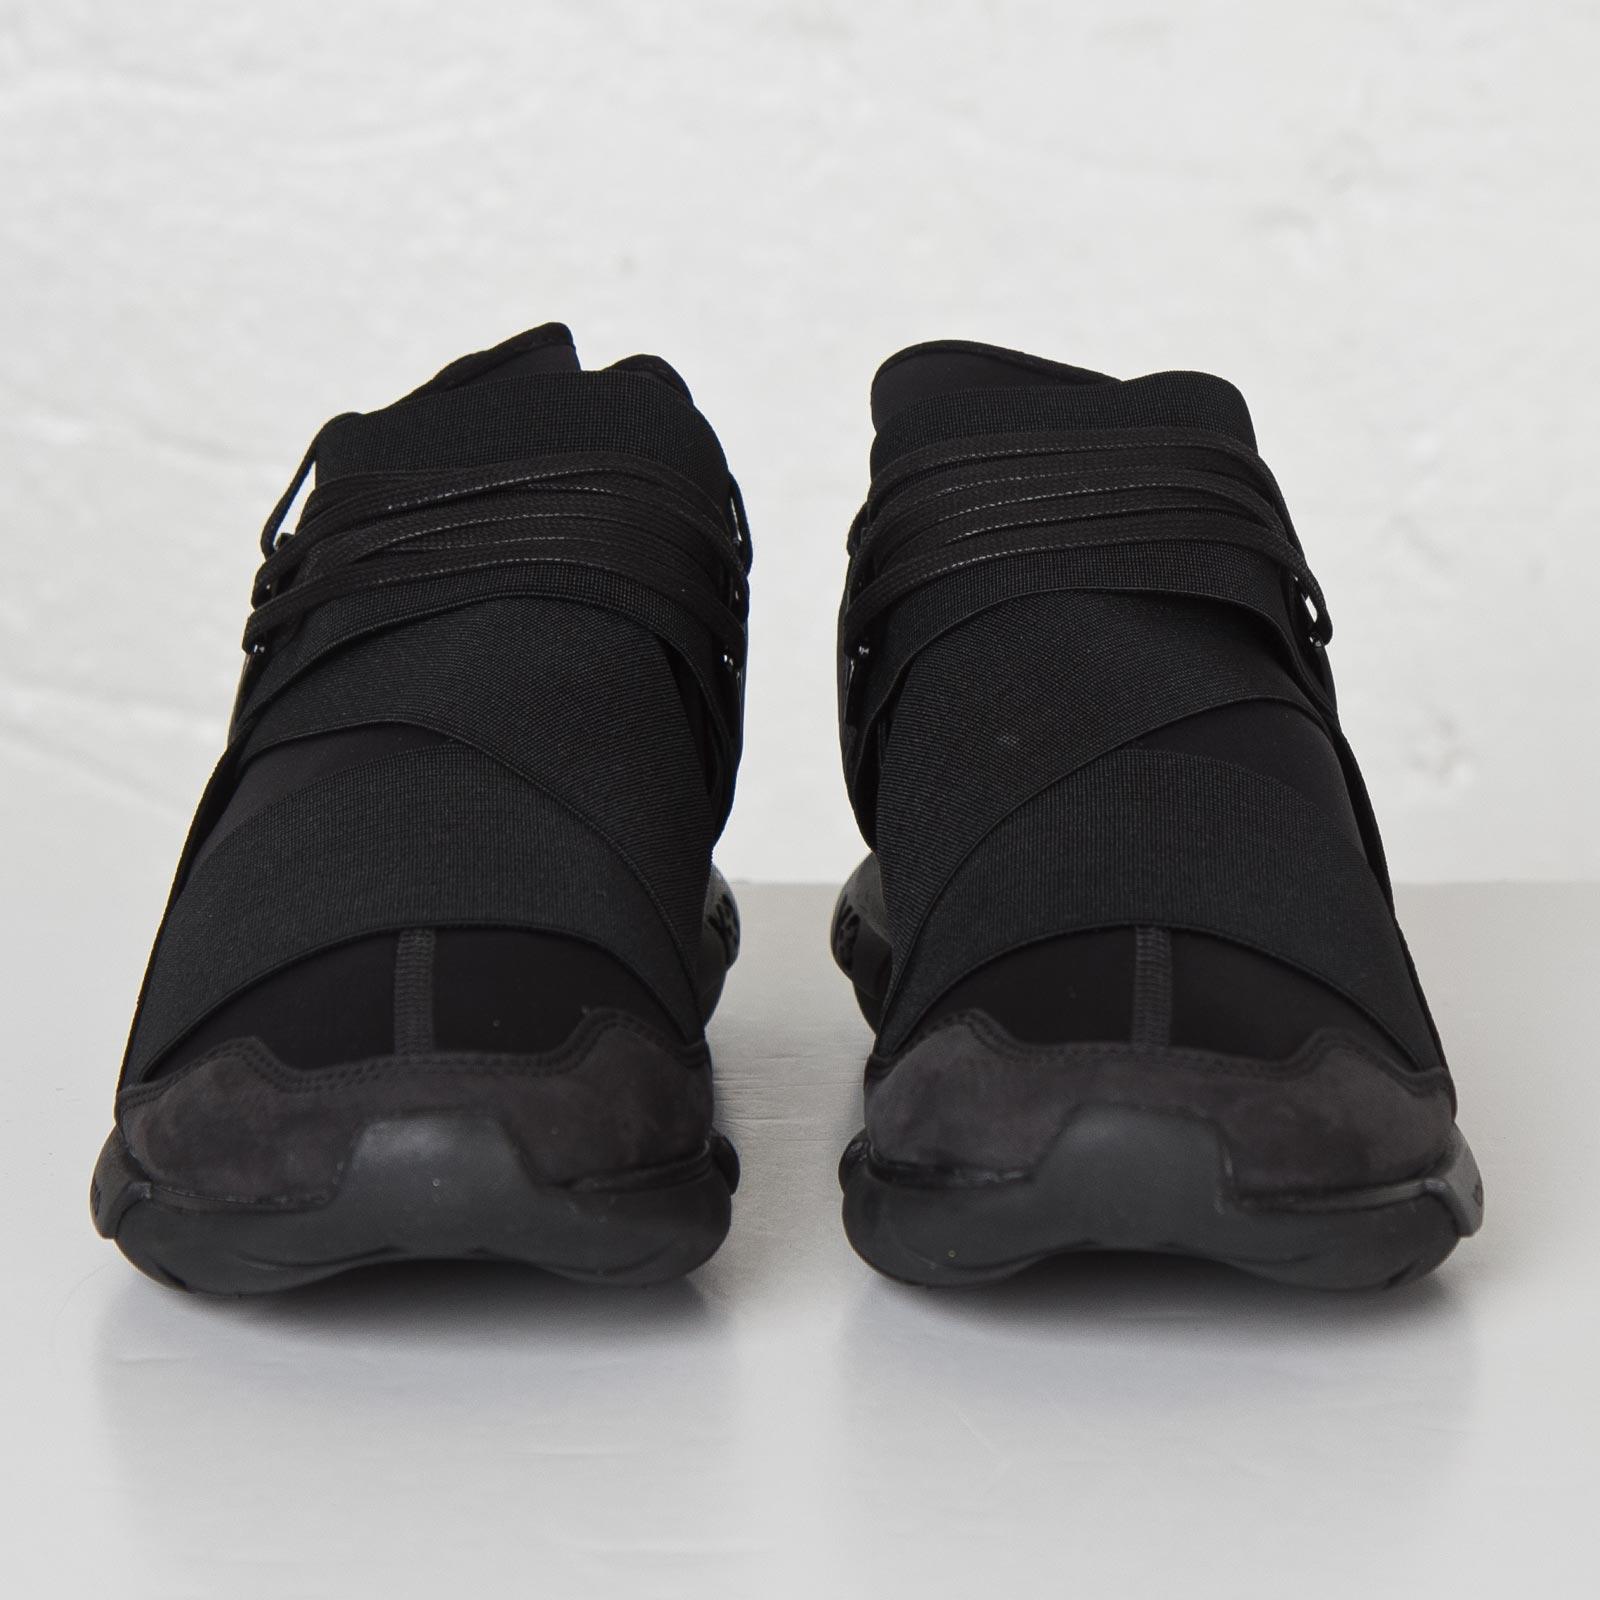 adidas Y-3 Qasa High - S83173